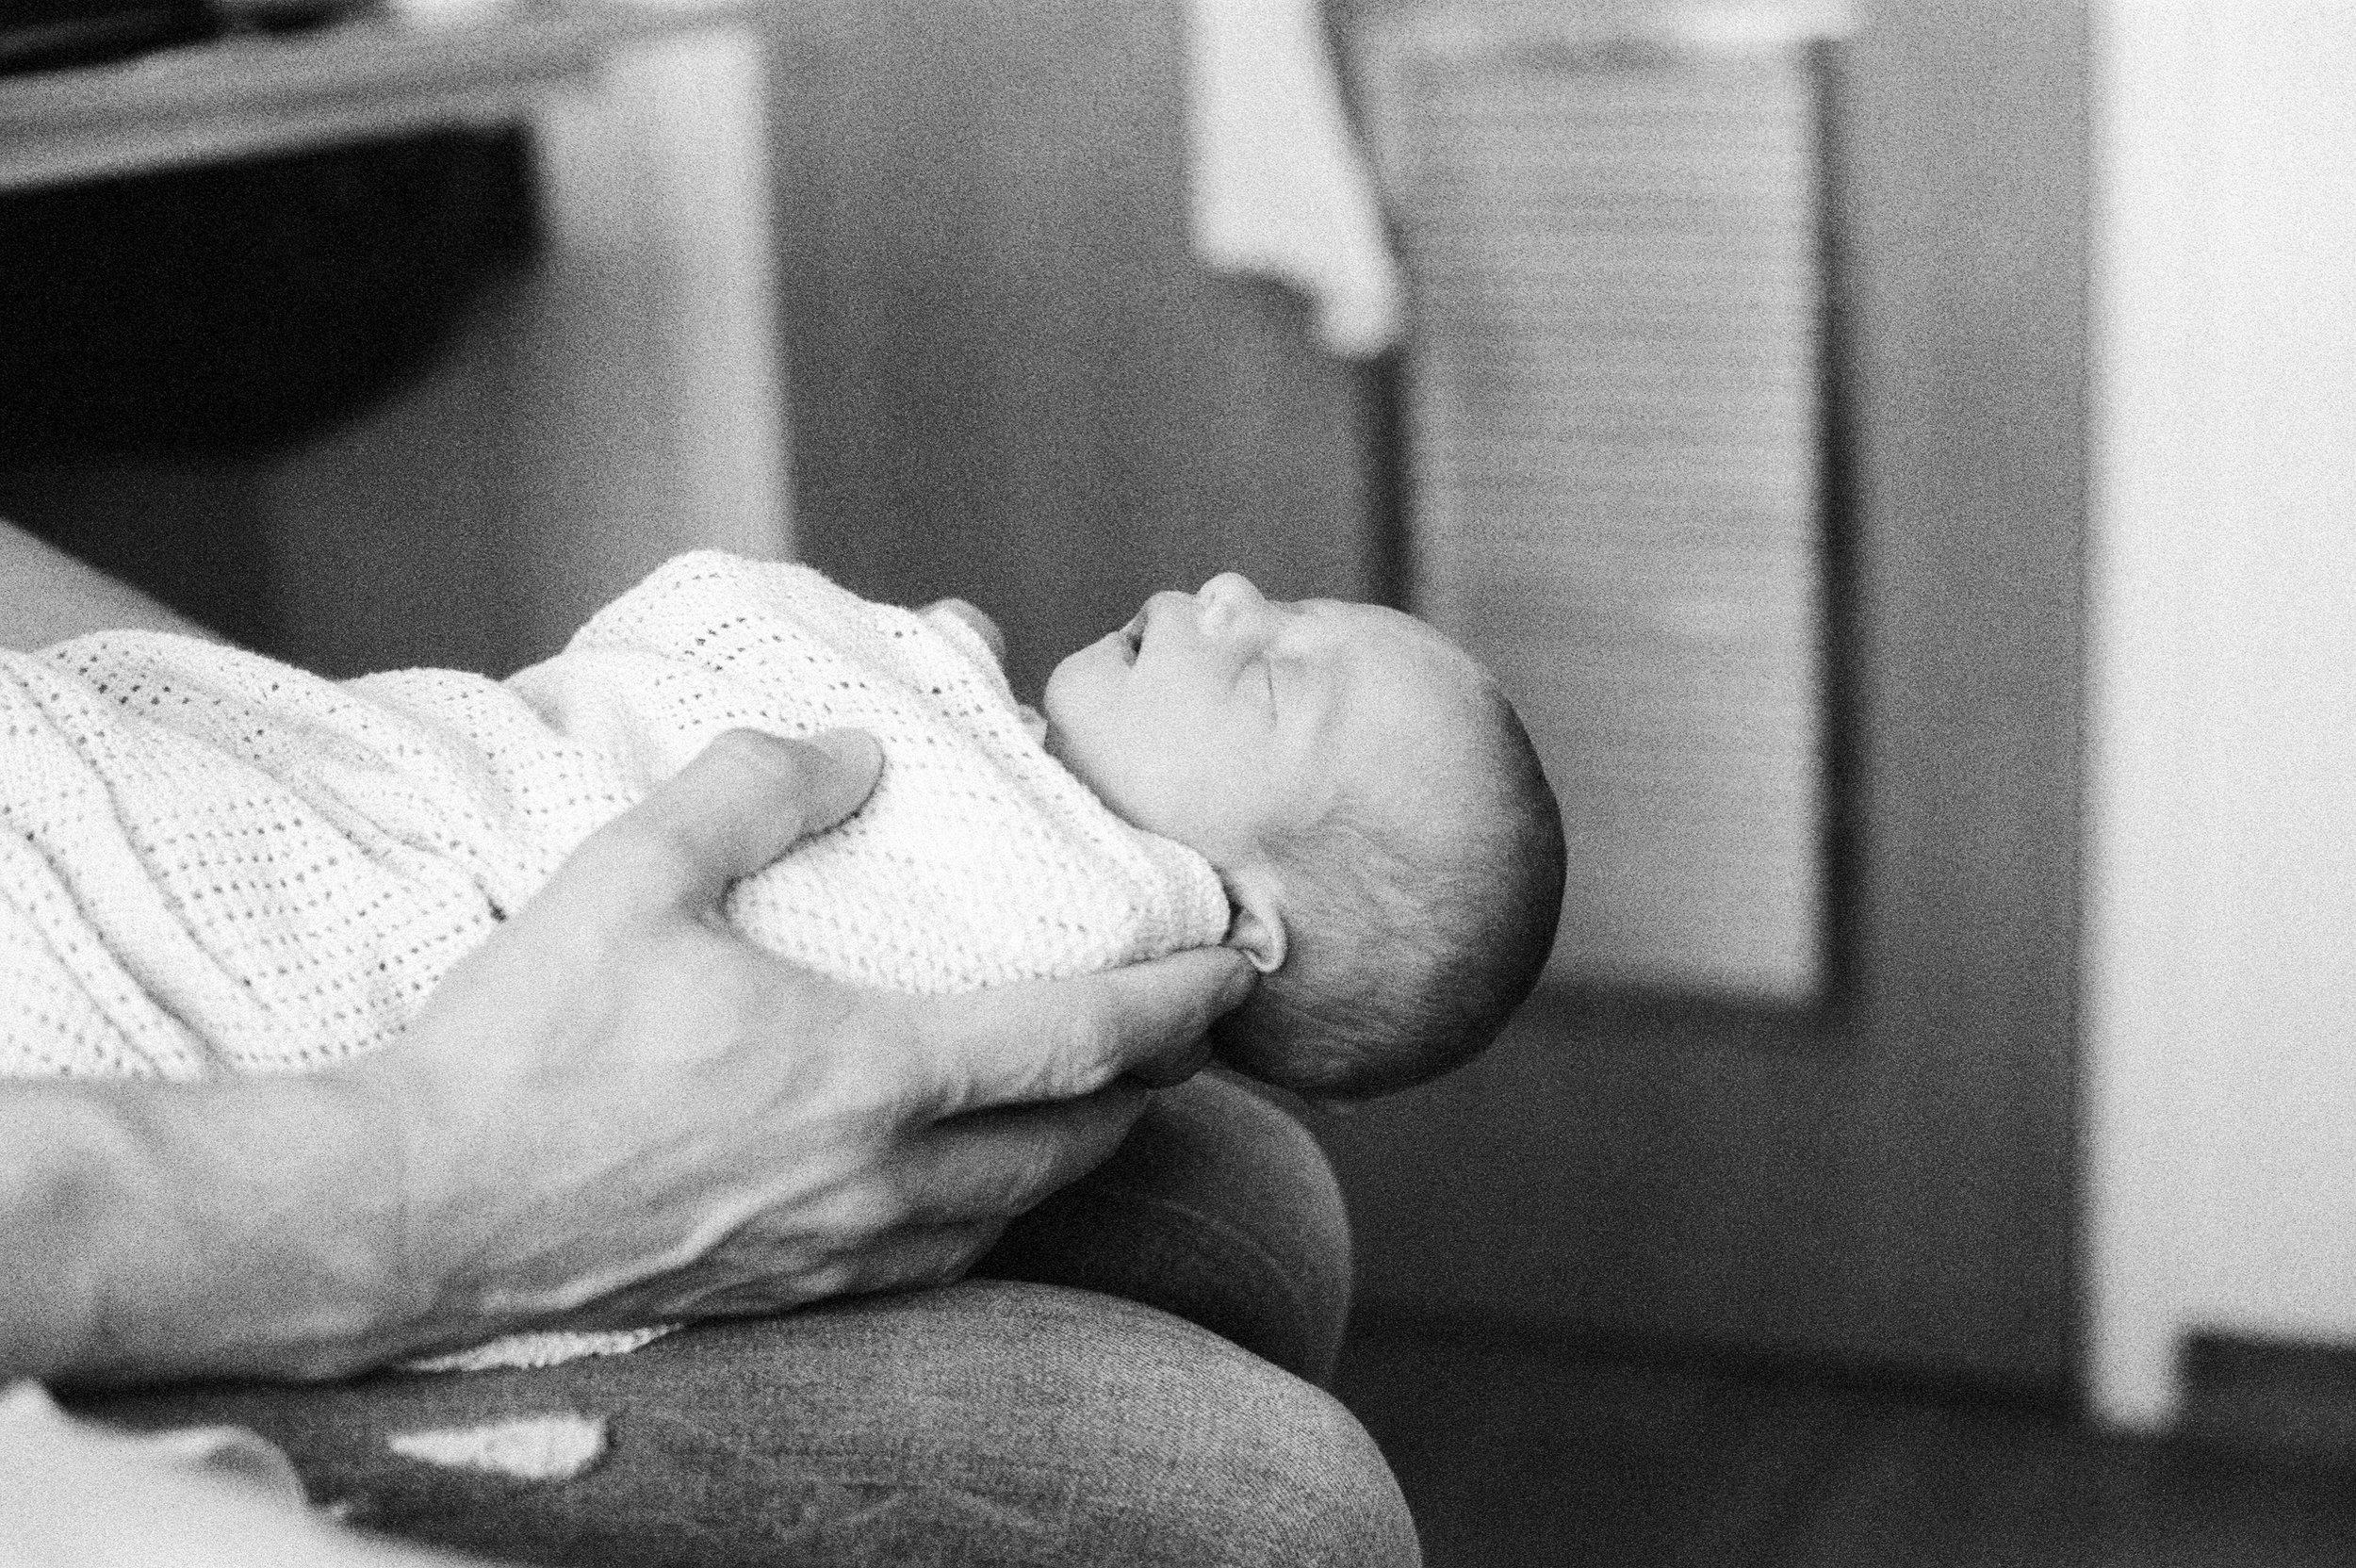 EmilyWPhotography_natural_light_baby_photographer_guildford_surrey_london_04.jpeg